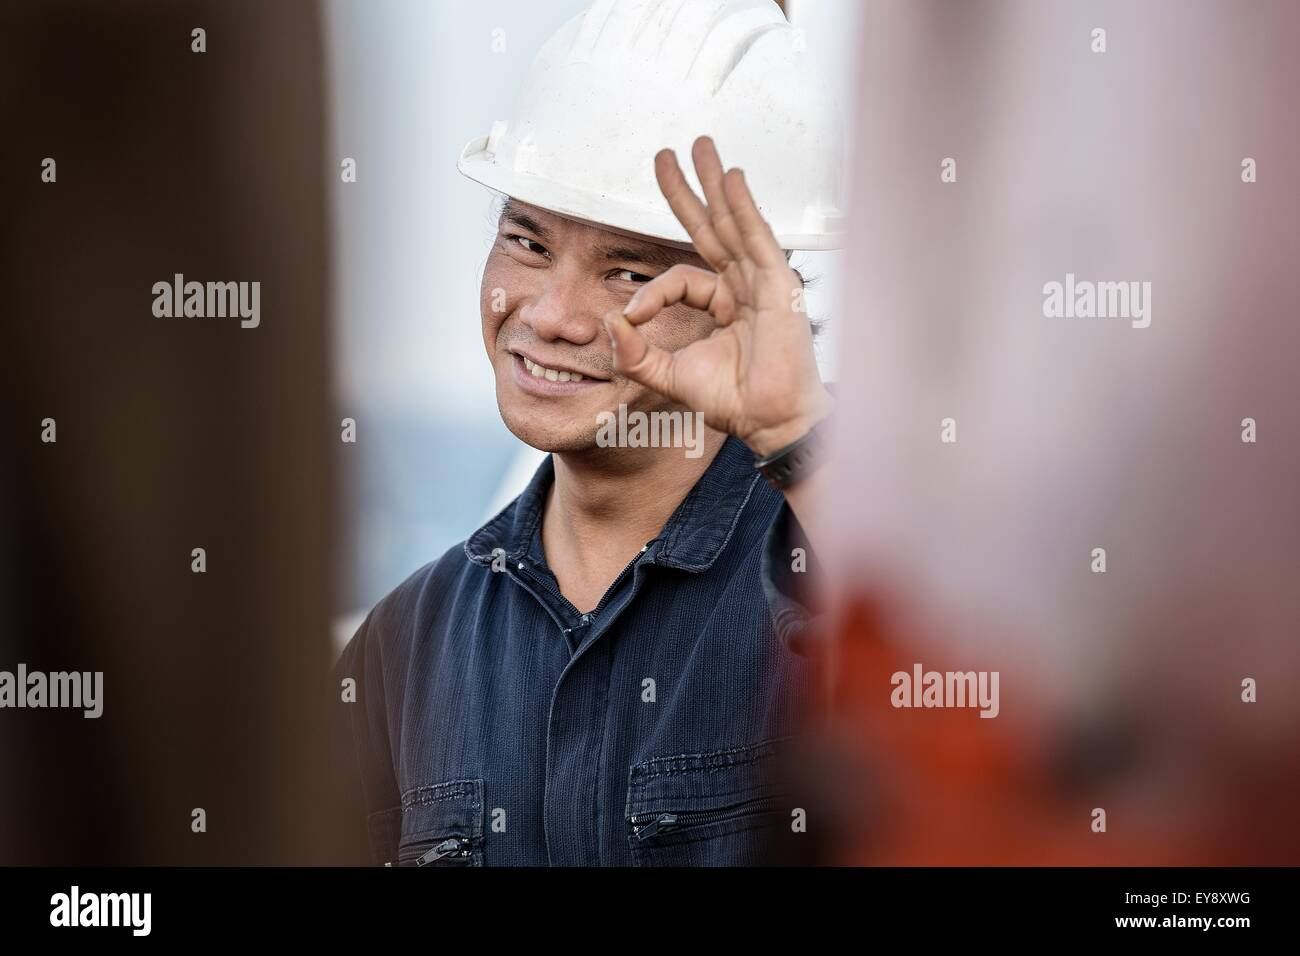 Porträt des Arbeitnehmers auf Öltanker Ordnung Geste Stockbild